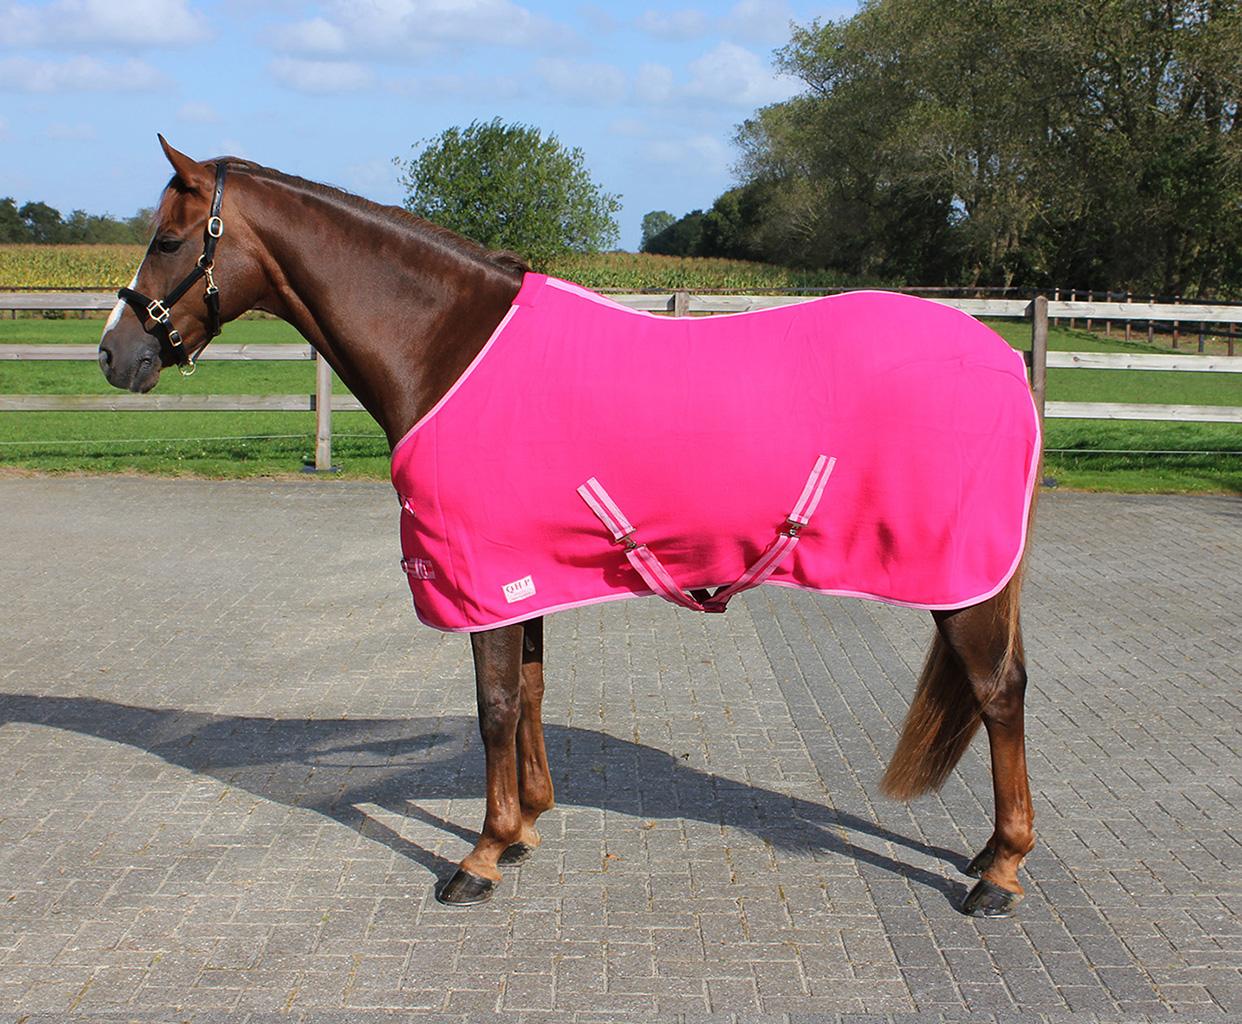 Qhp Fleece Rug Elite Equestrian